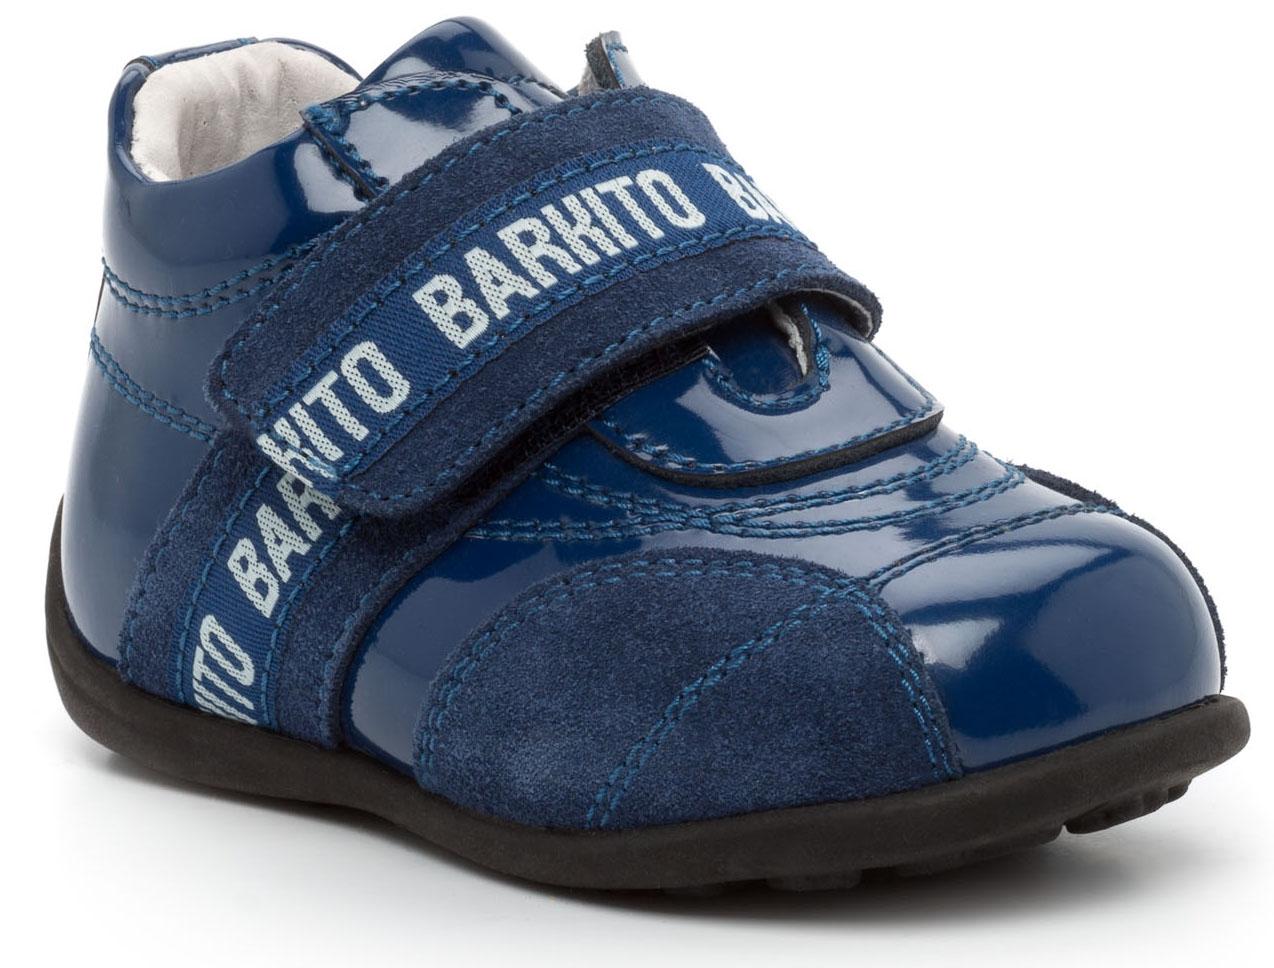 Ботинки и полуботинки Barkito Полуботинки для мальчика Barkito, темно-синие